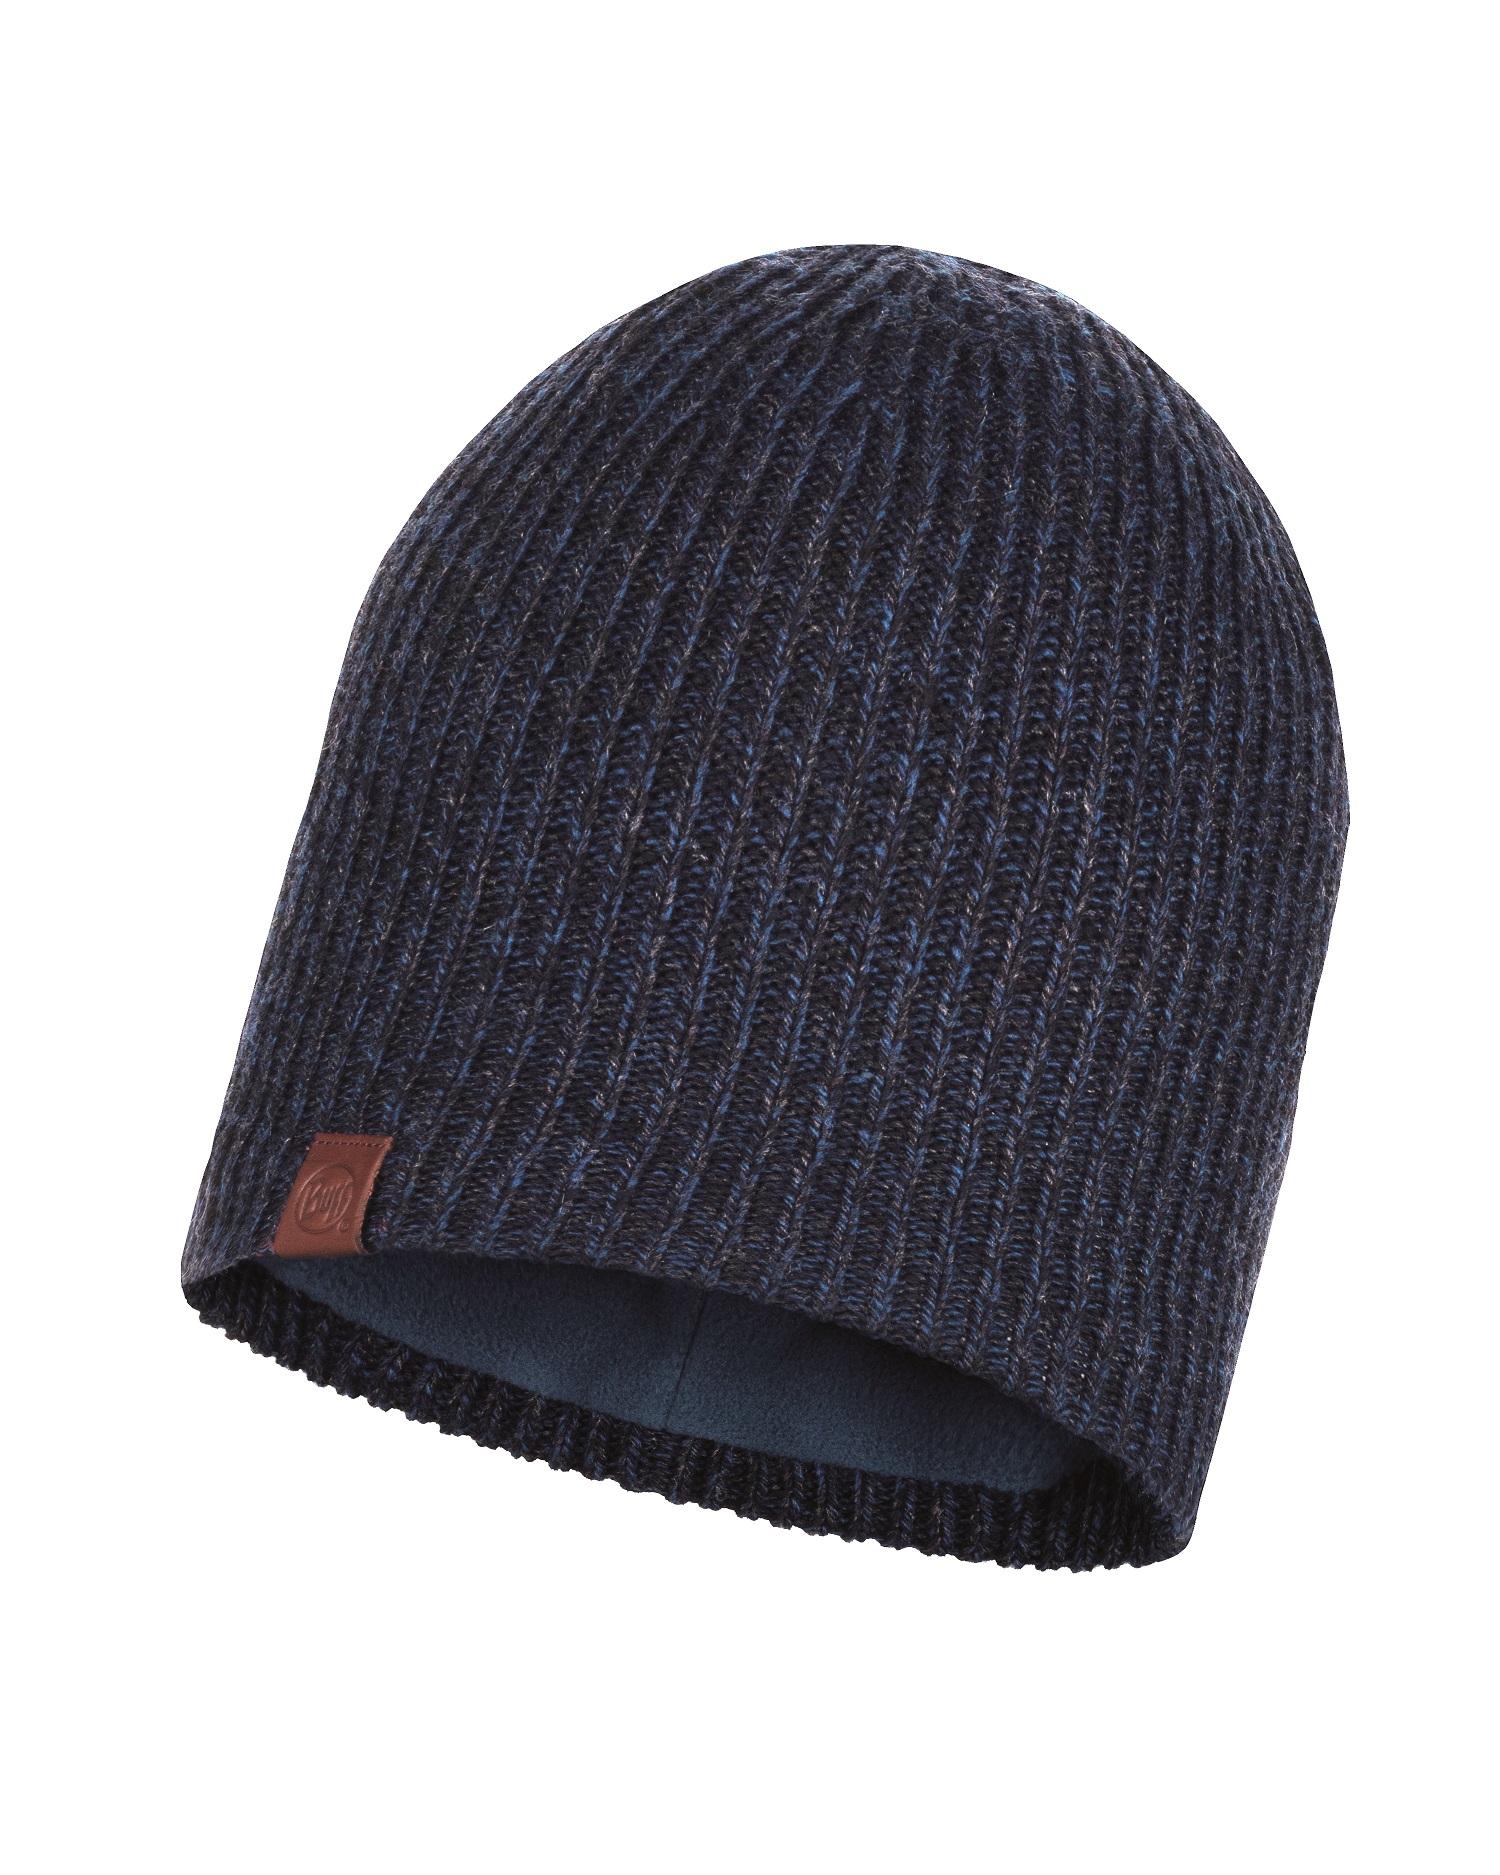 Шапка Buff Knitted & Polar Hat Lyne Night Blue